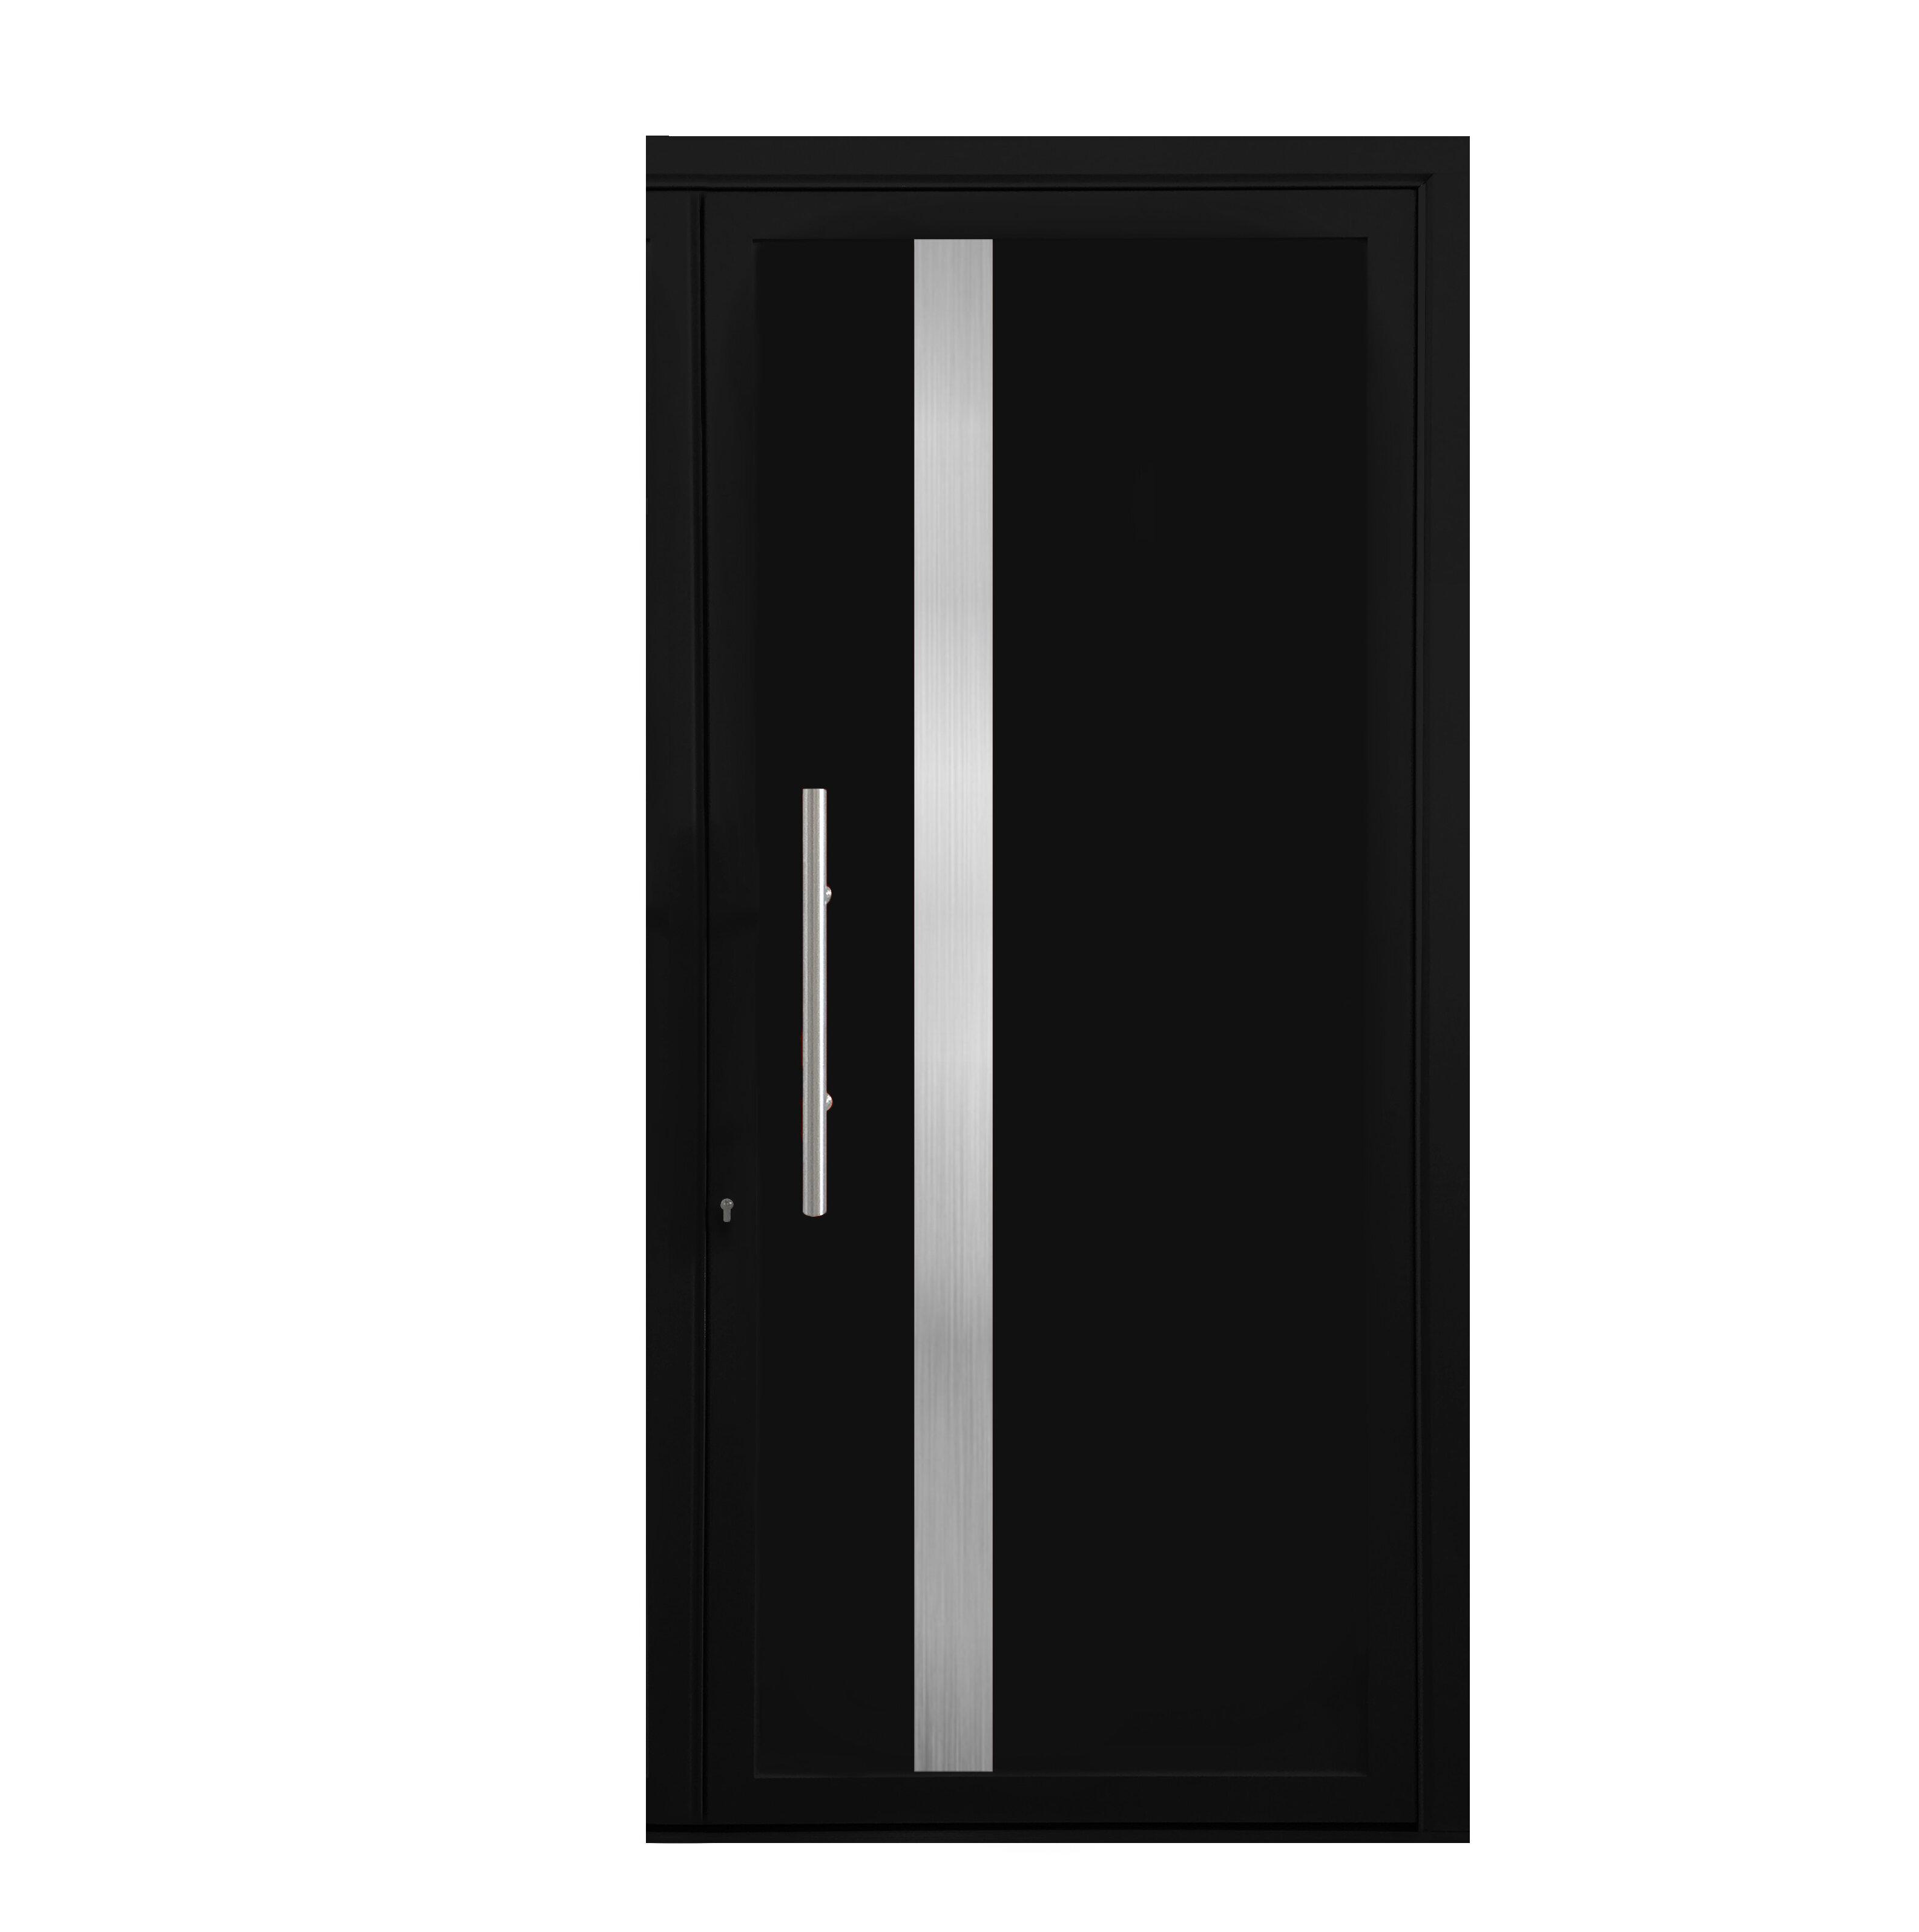 Gemini Aluminum Prehung Front Entry Door By Cbw Windows And Doors